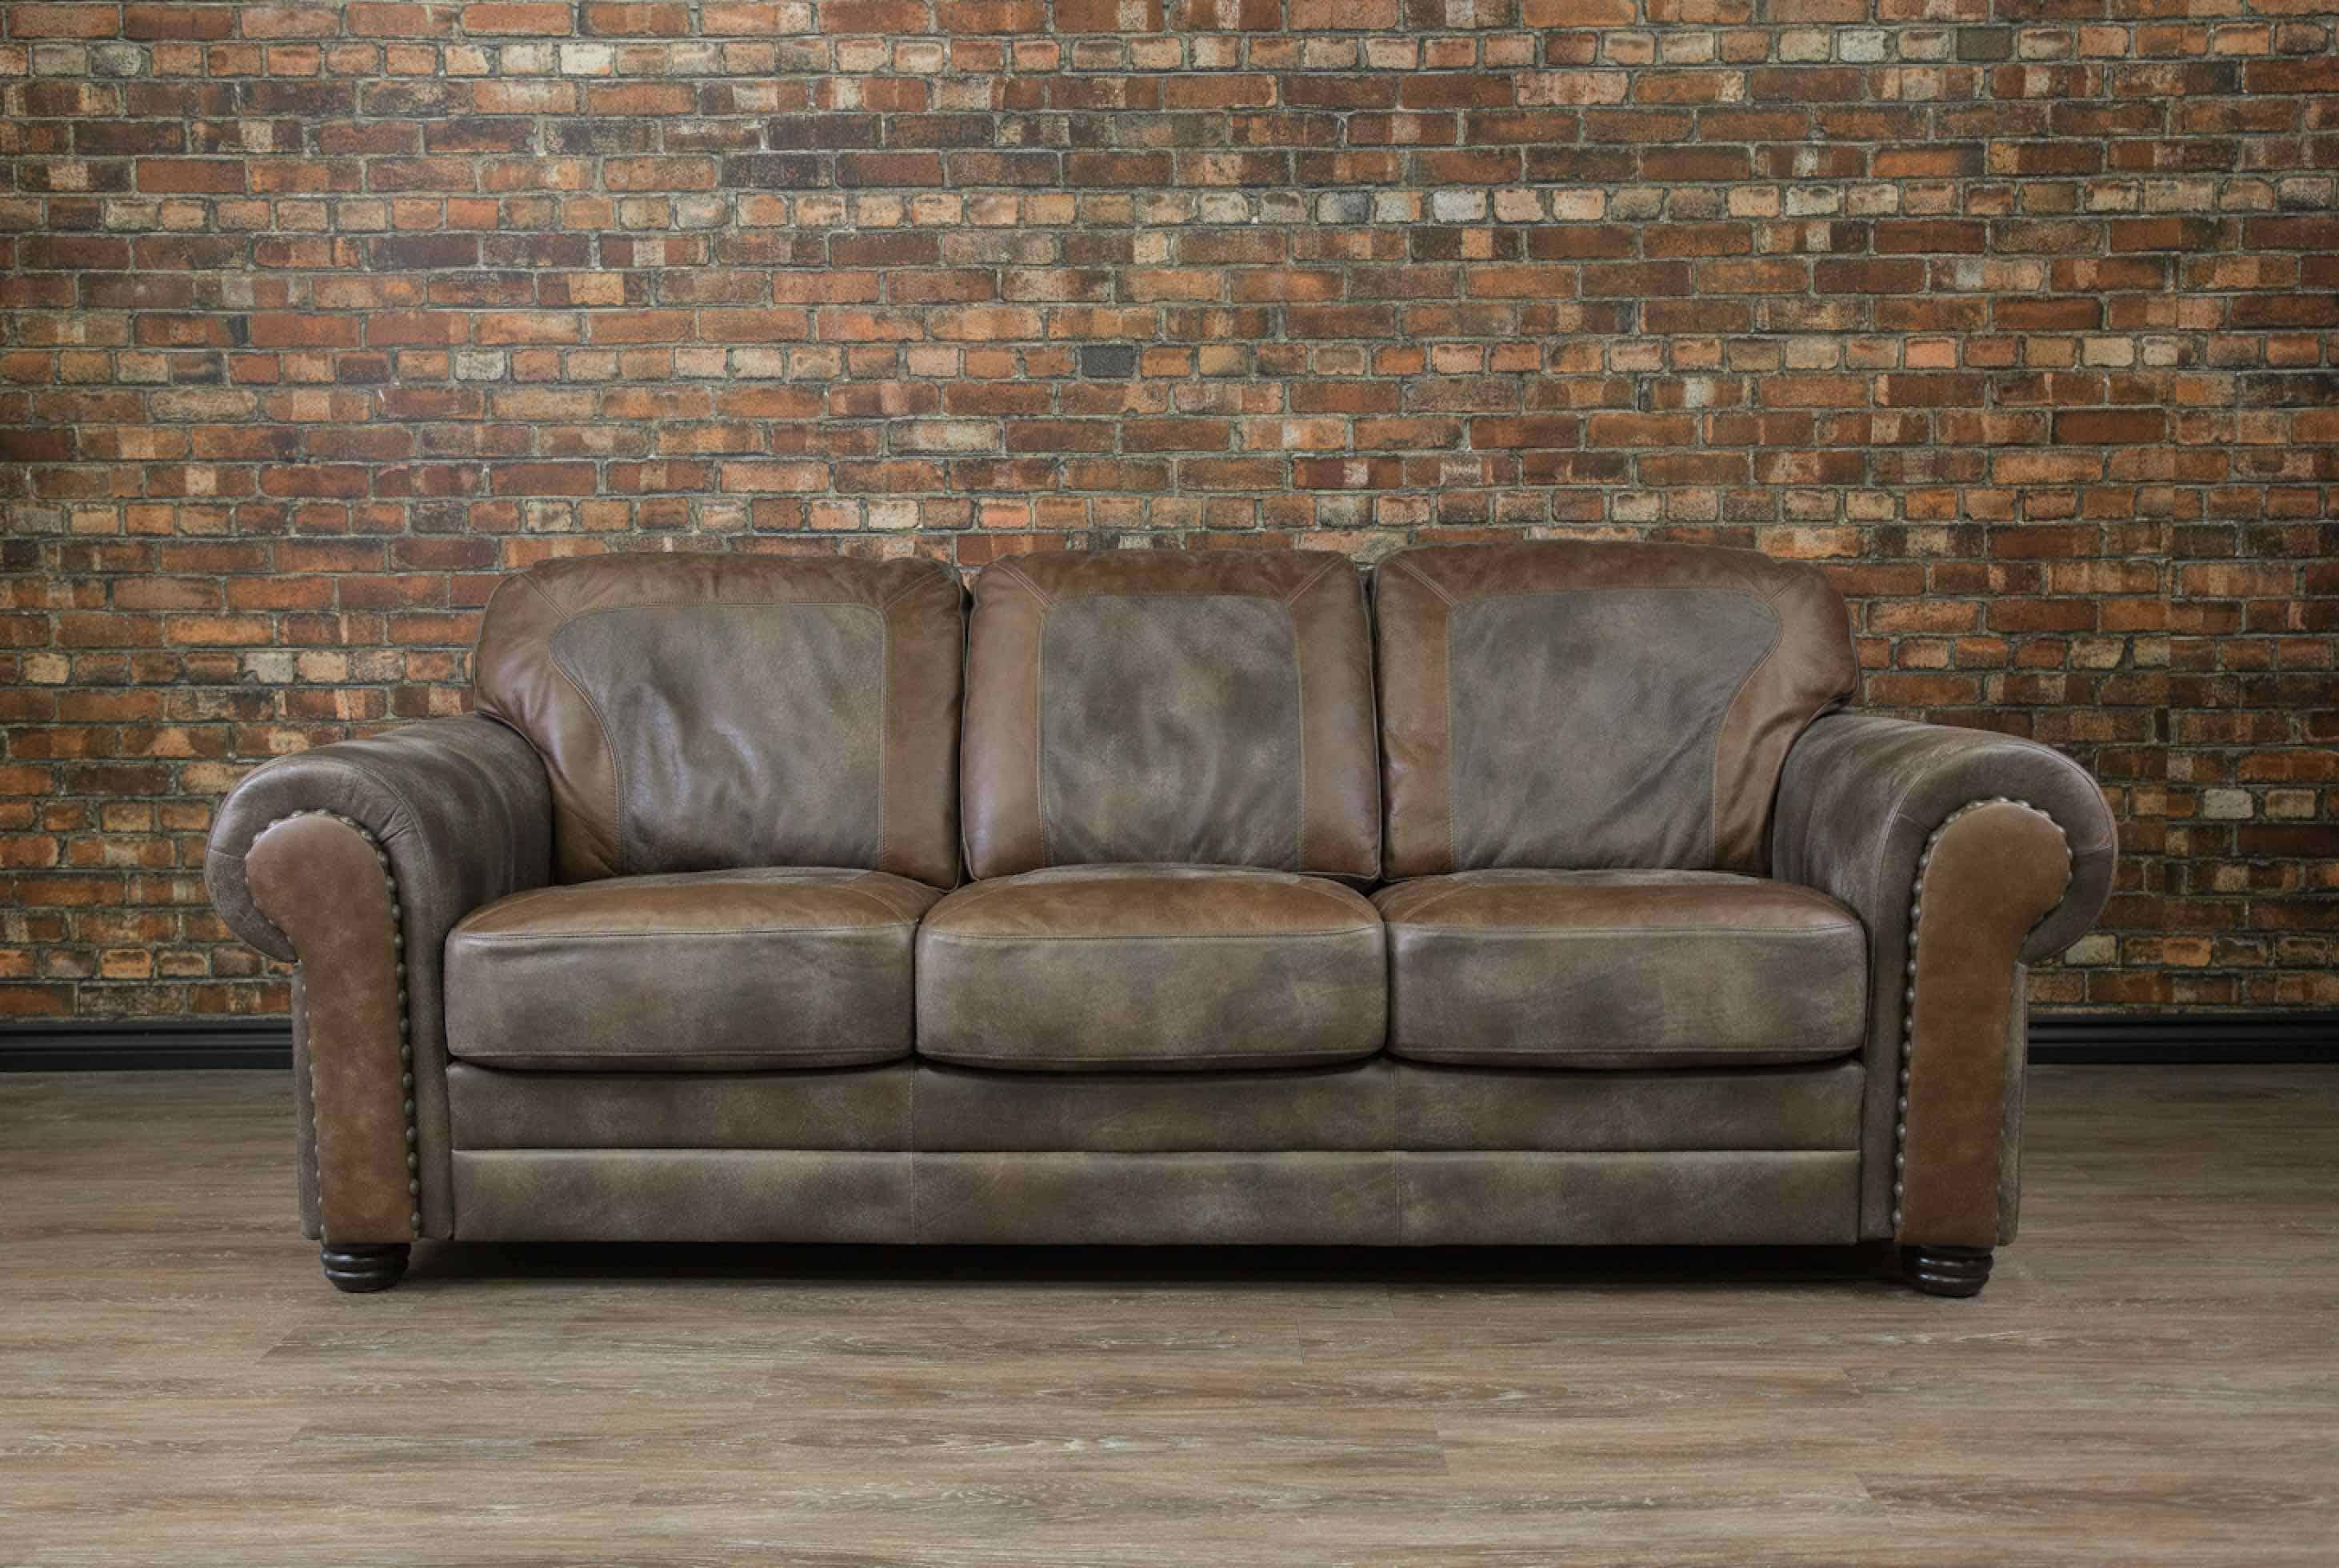 custom sectional sofa chicago cindy crawford sofas reviews for sale modern home interior ideas